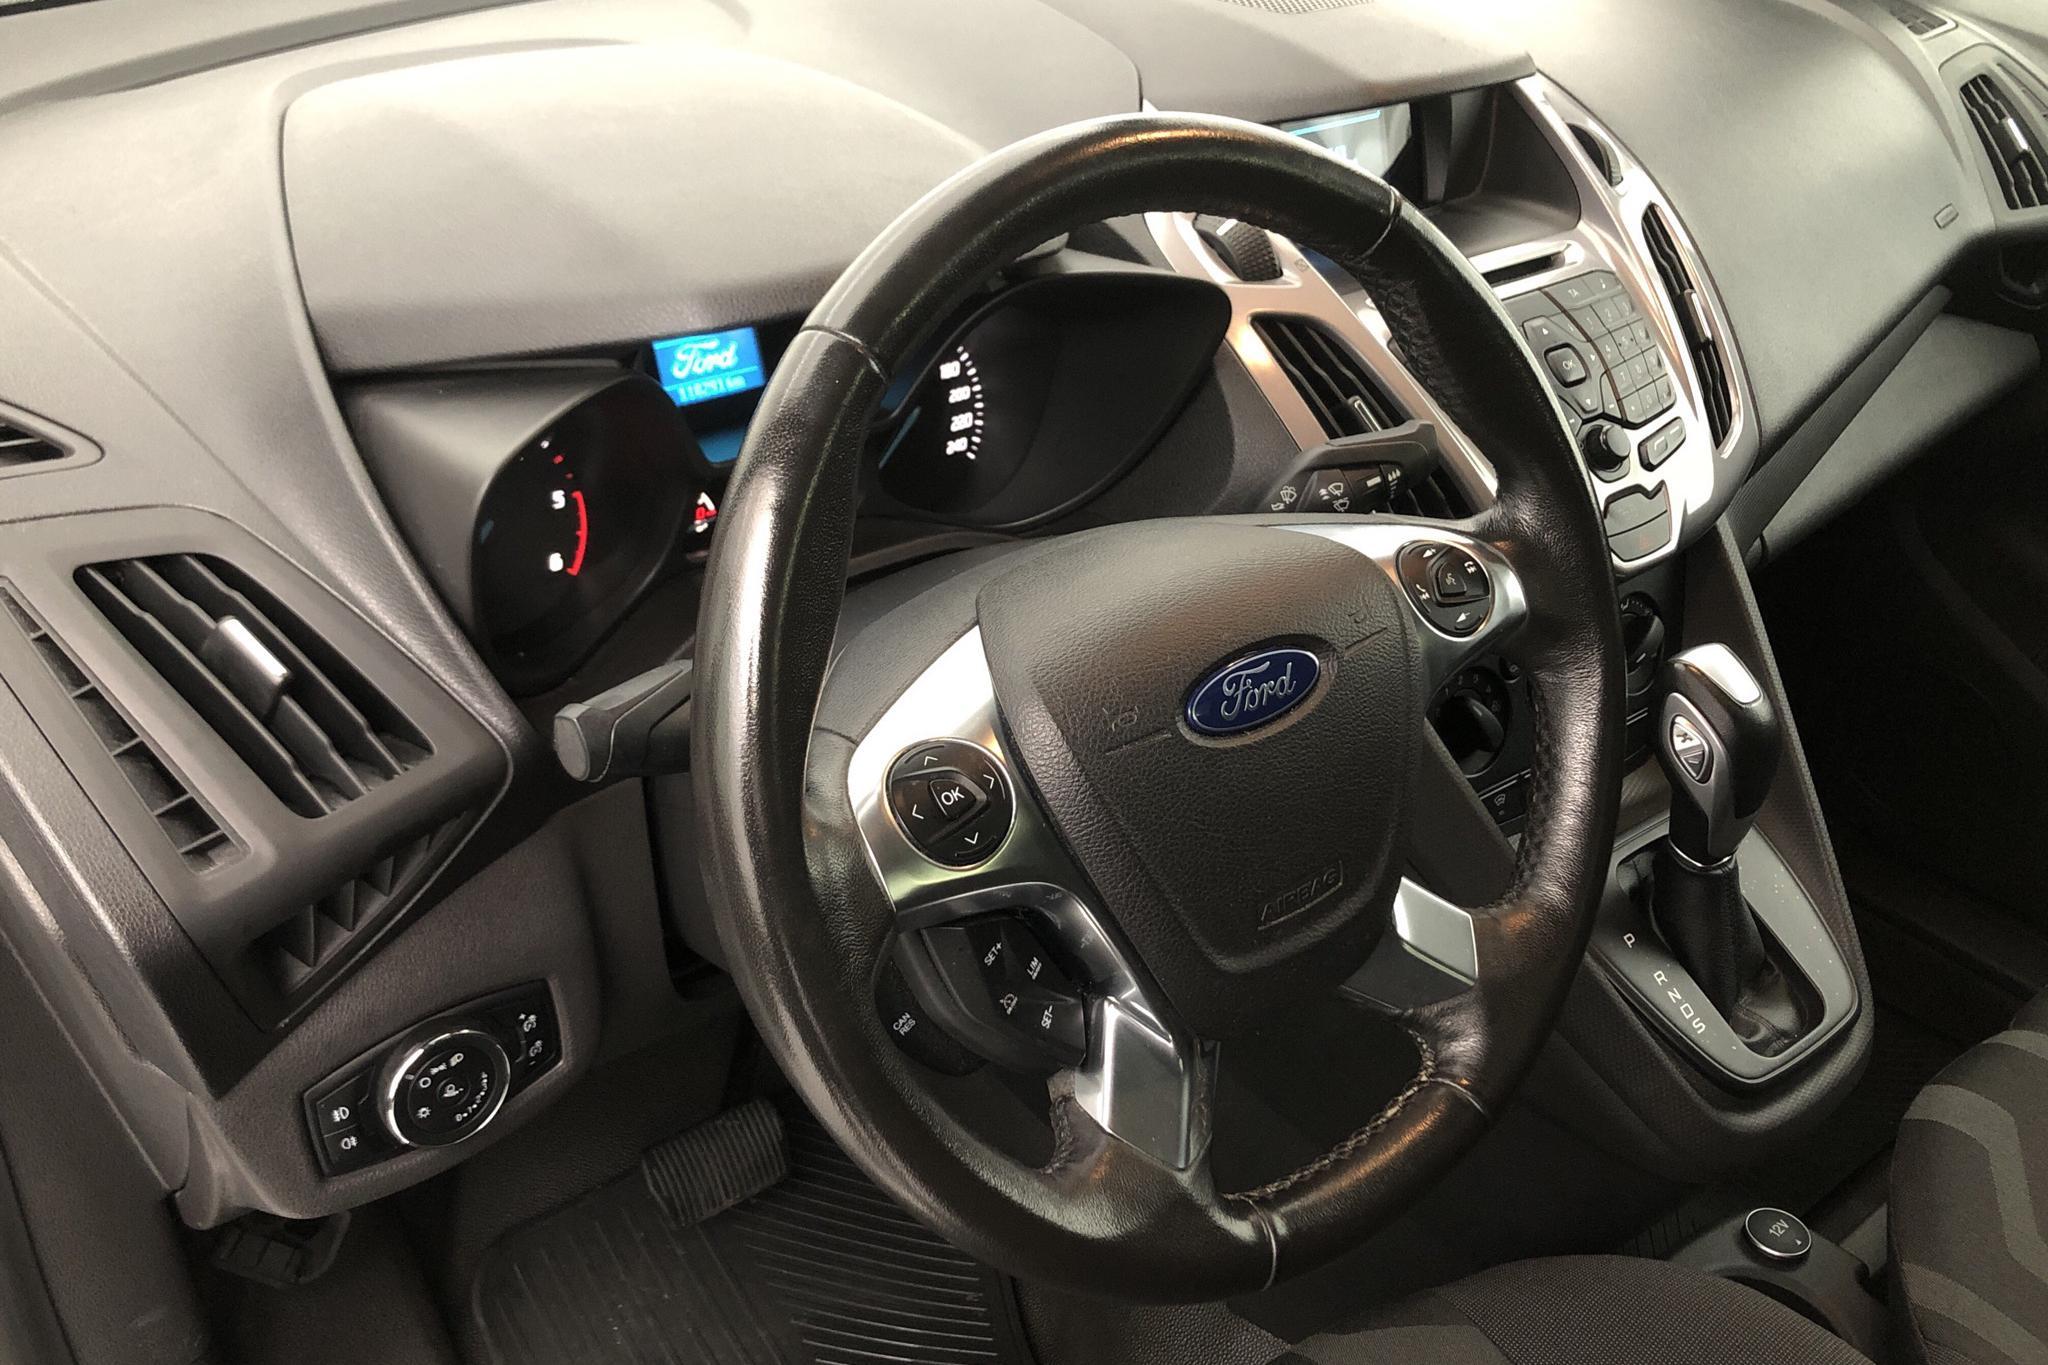 Ford Transit Connect 1.5 TDCi (120hk) - 11 829 mil - Automat - vit - 2016